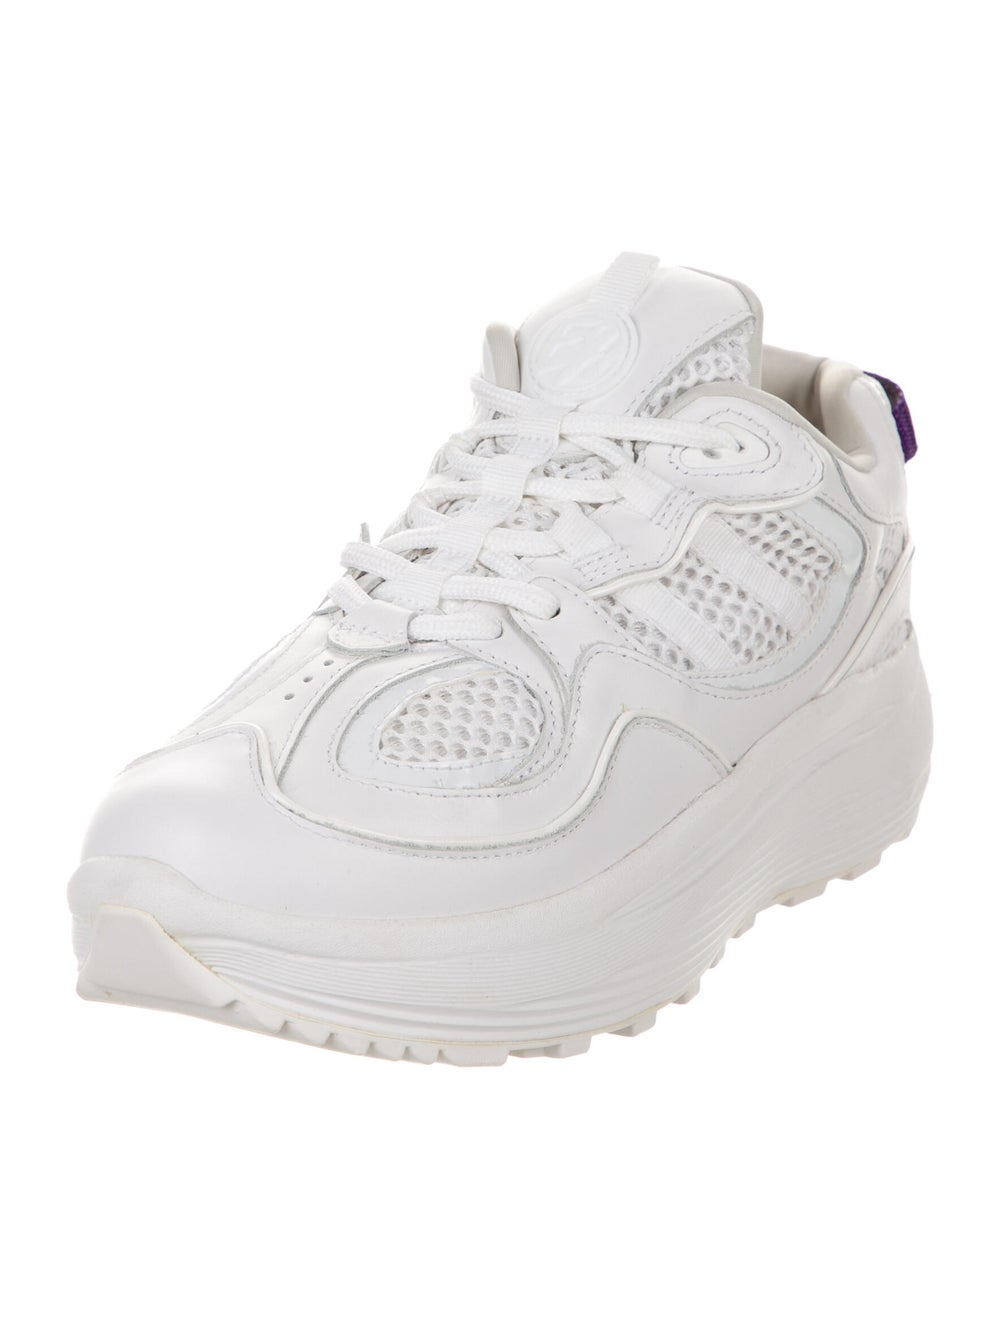 Eytys Snow Turbo Sneakers White - image 2